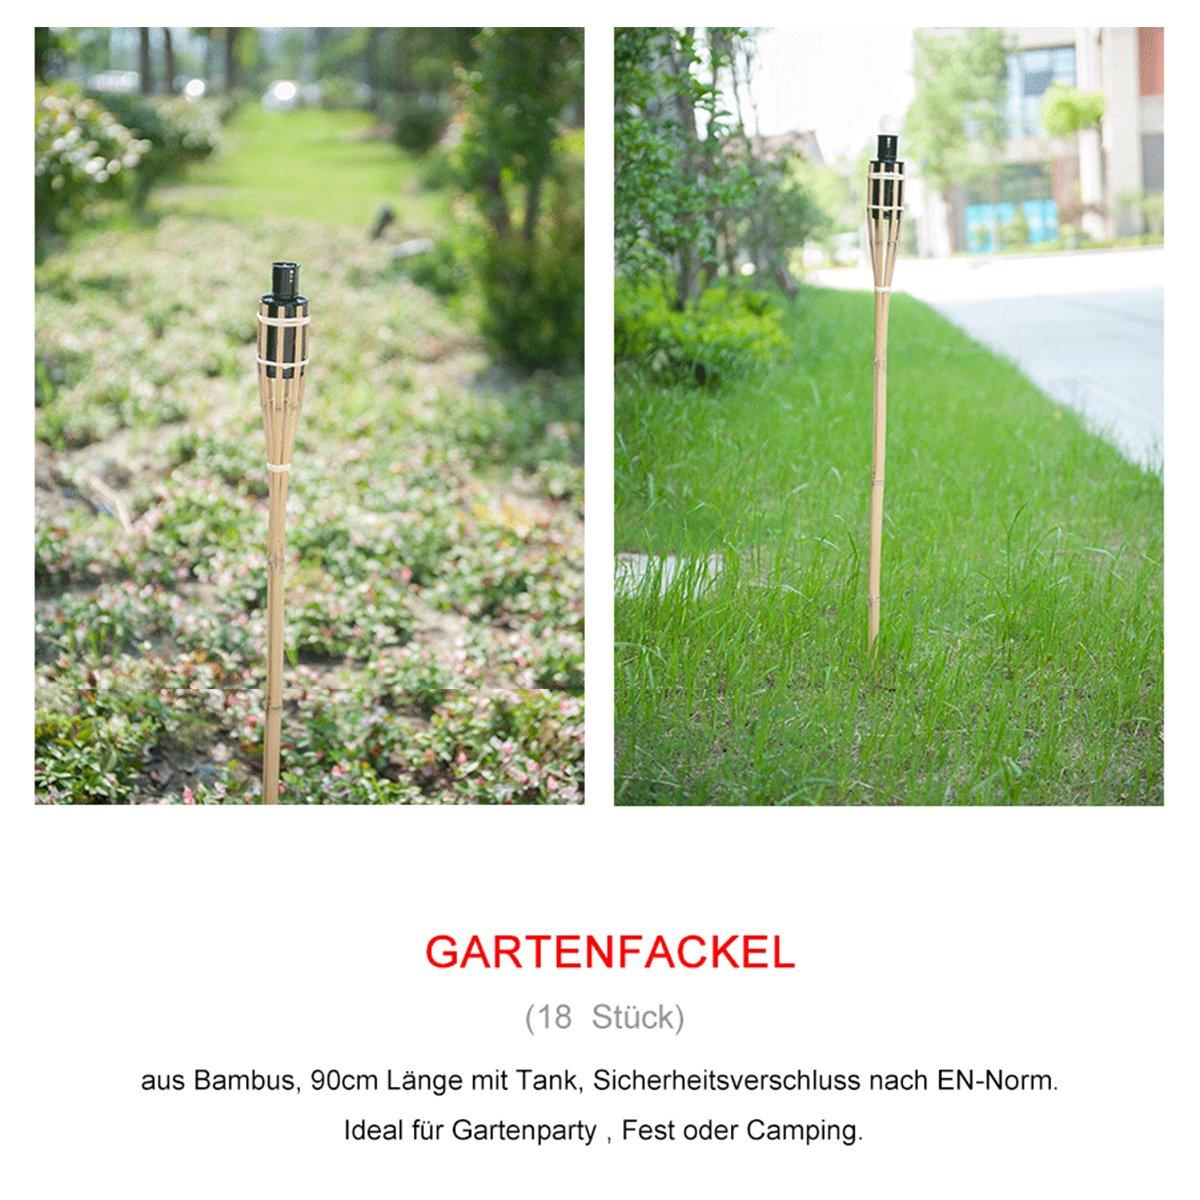 DXP 18x Gartenfackel Bambus Bambusfackeln 90cm Öllampen mit Sturmverschluss Dochtschutz Deko EZH-01 hillfield